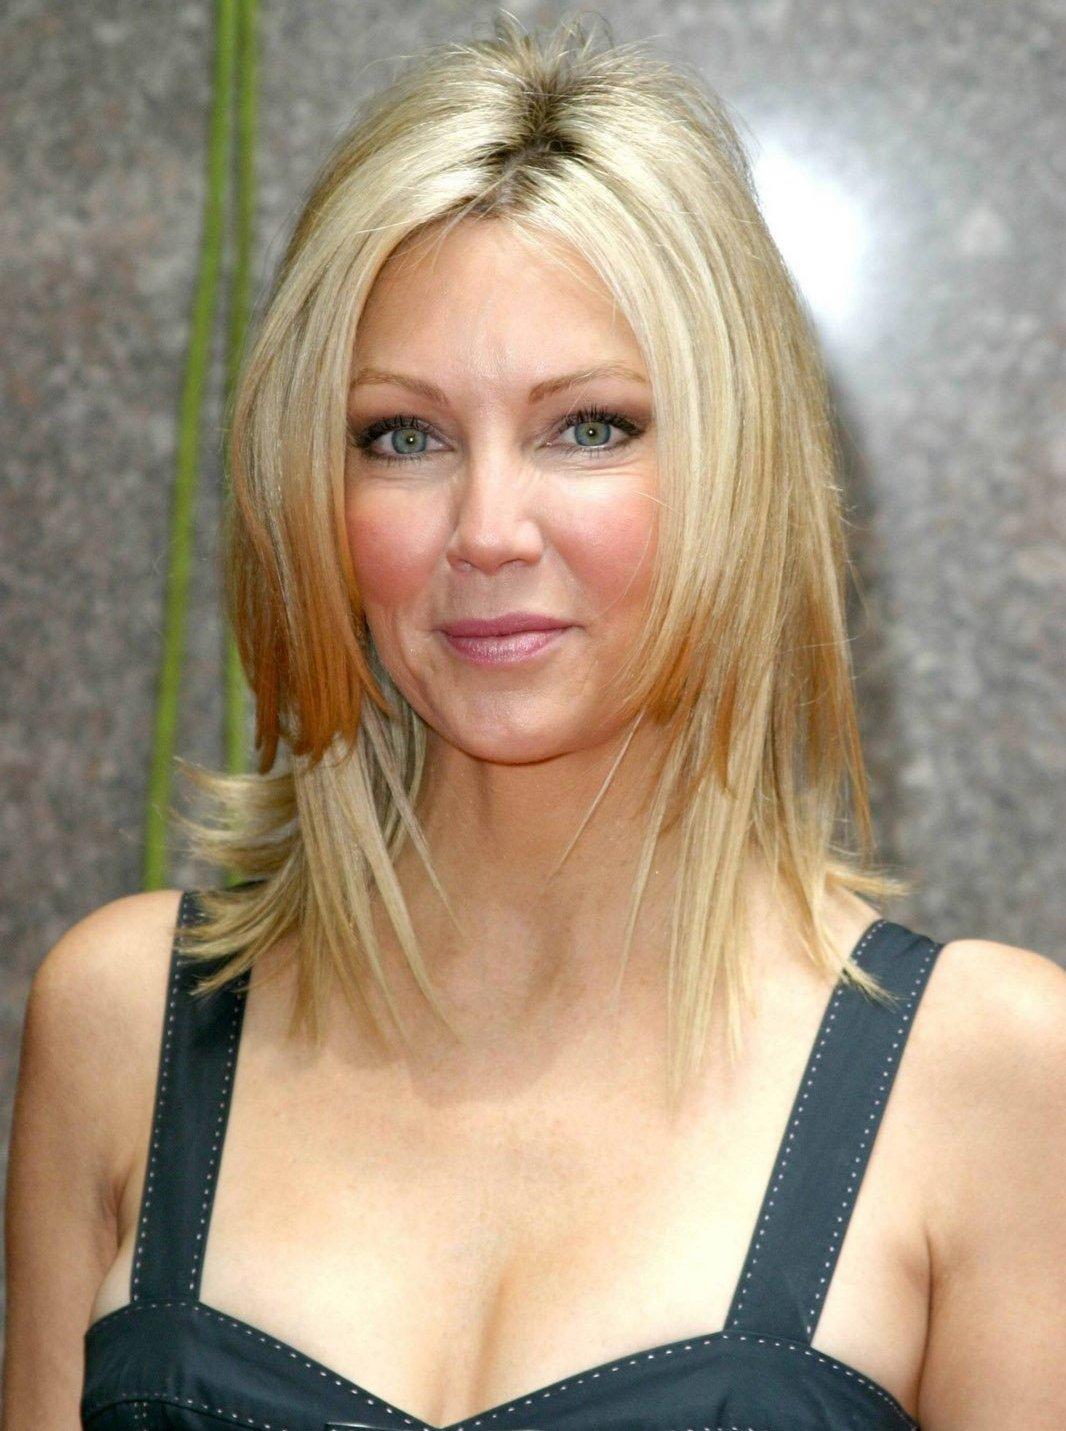 Варианты стрижки каскад на средние волосы фото